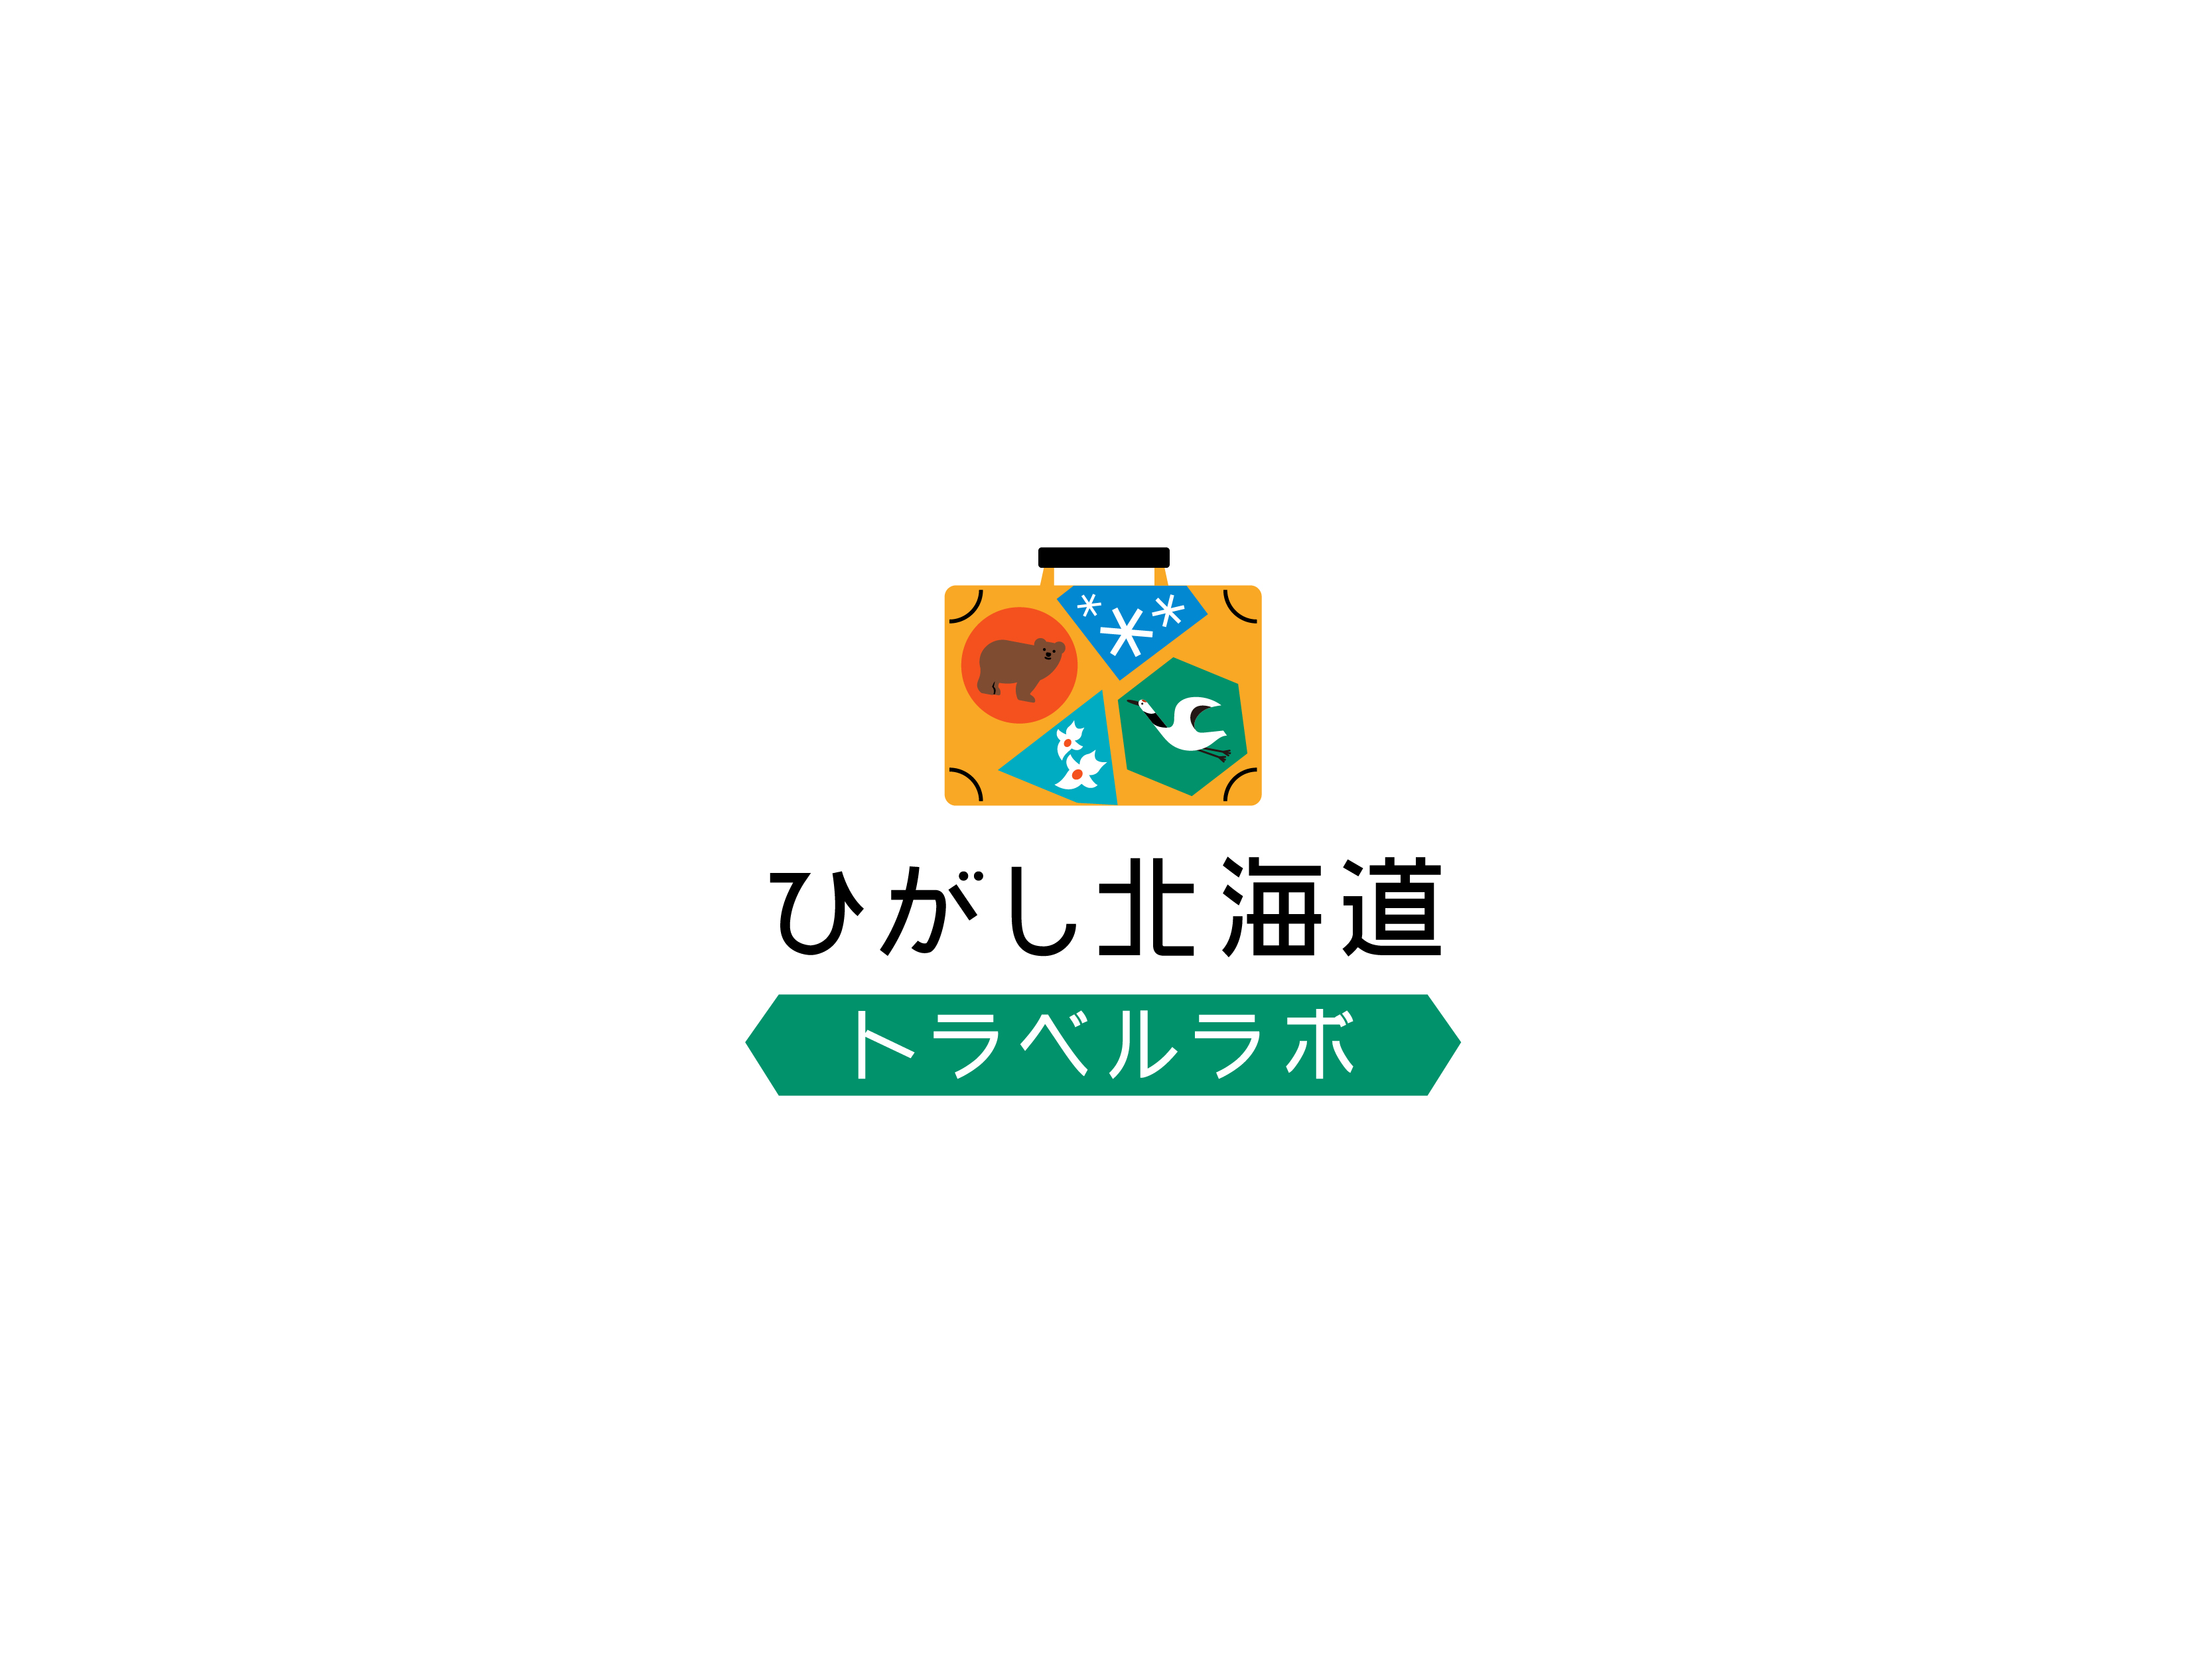 <span>logo</span><br>ひがし北海道自然美への道DMO<br>ひがし北海道トラベルラボ